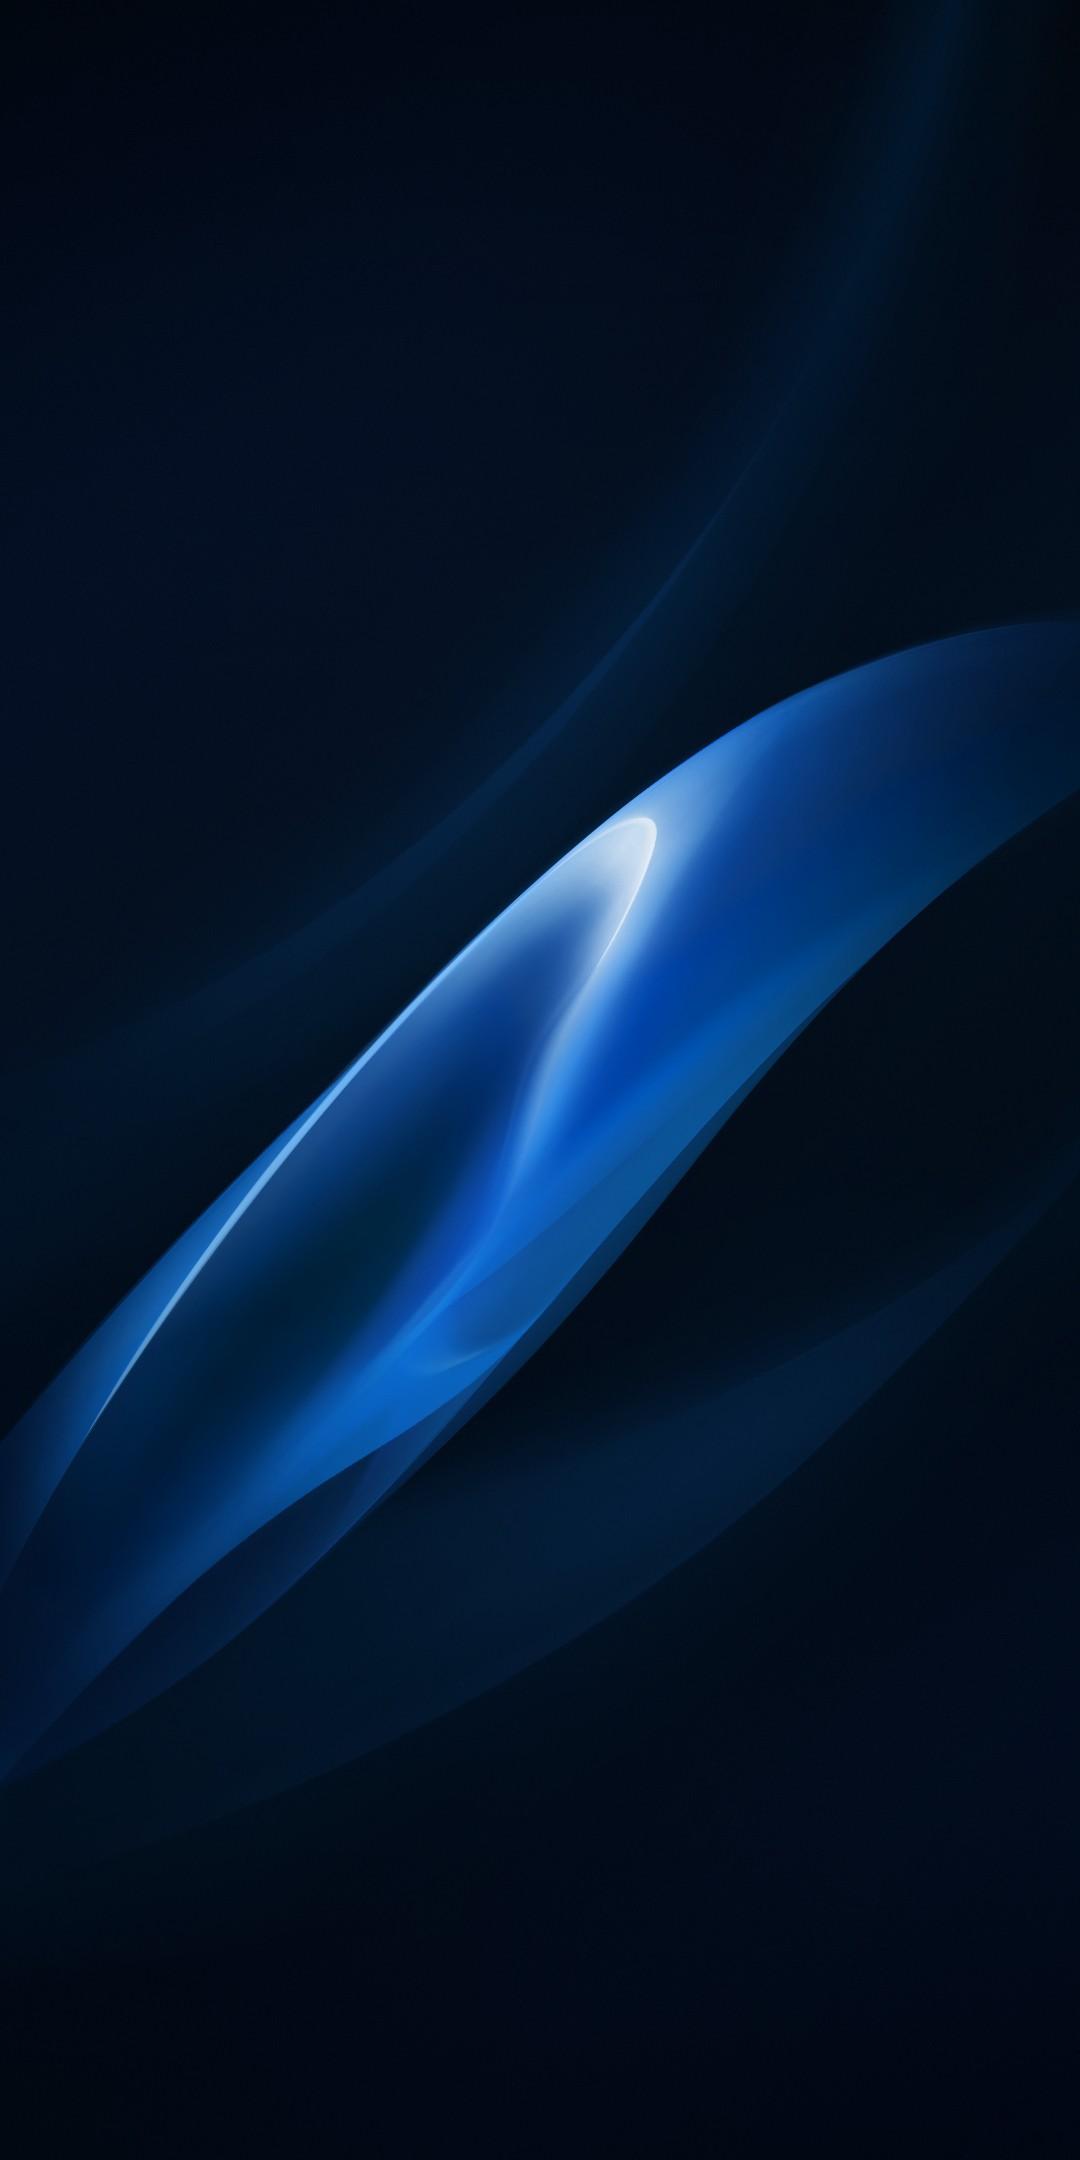 Blue Black Wallpaper